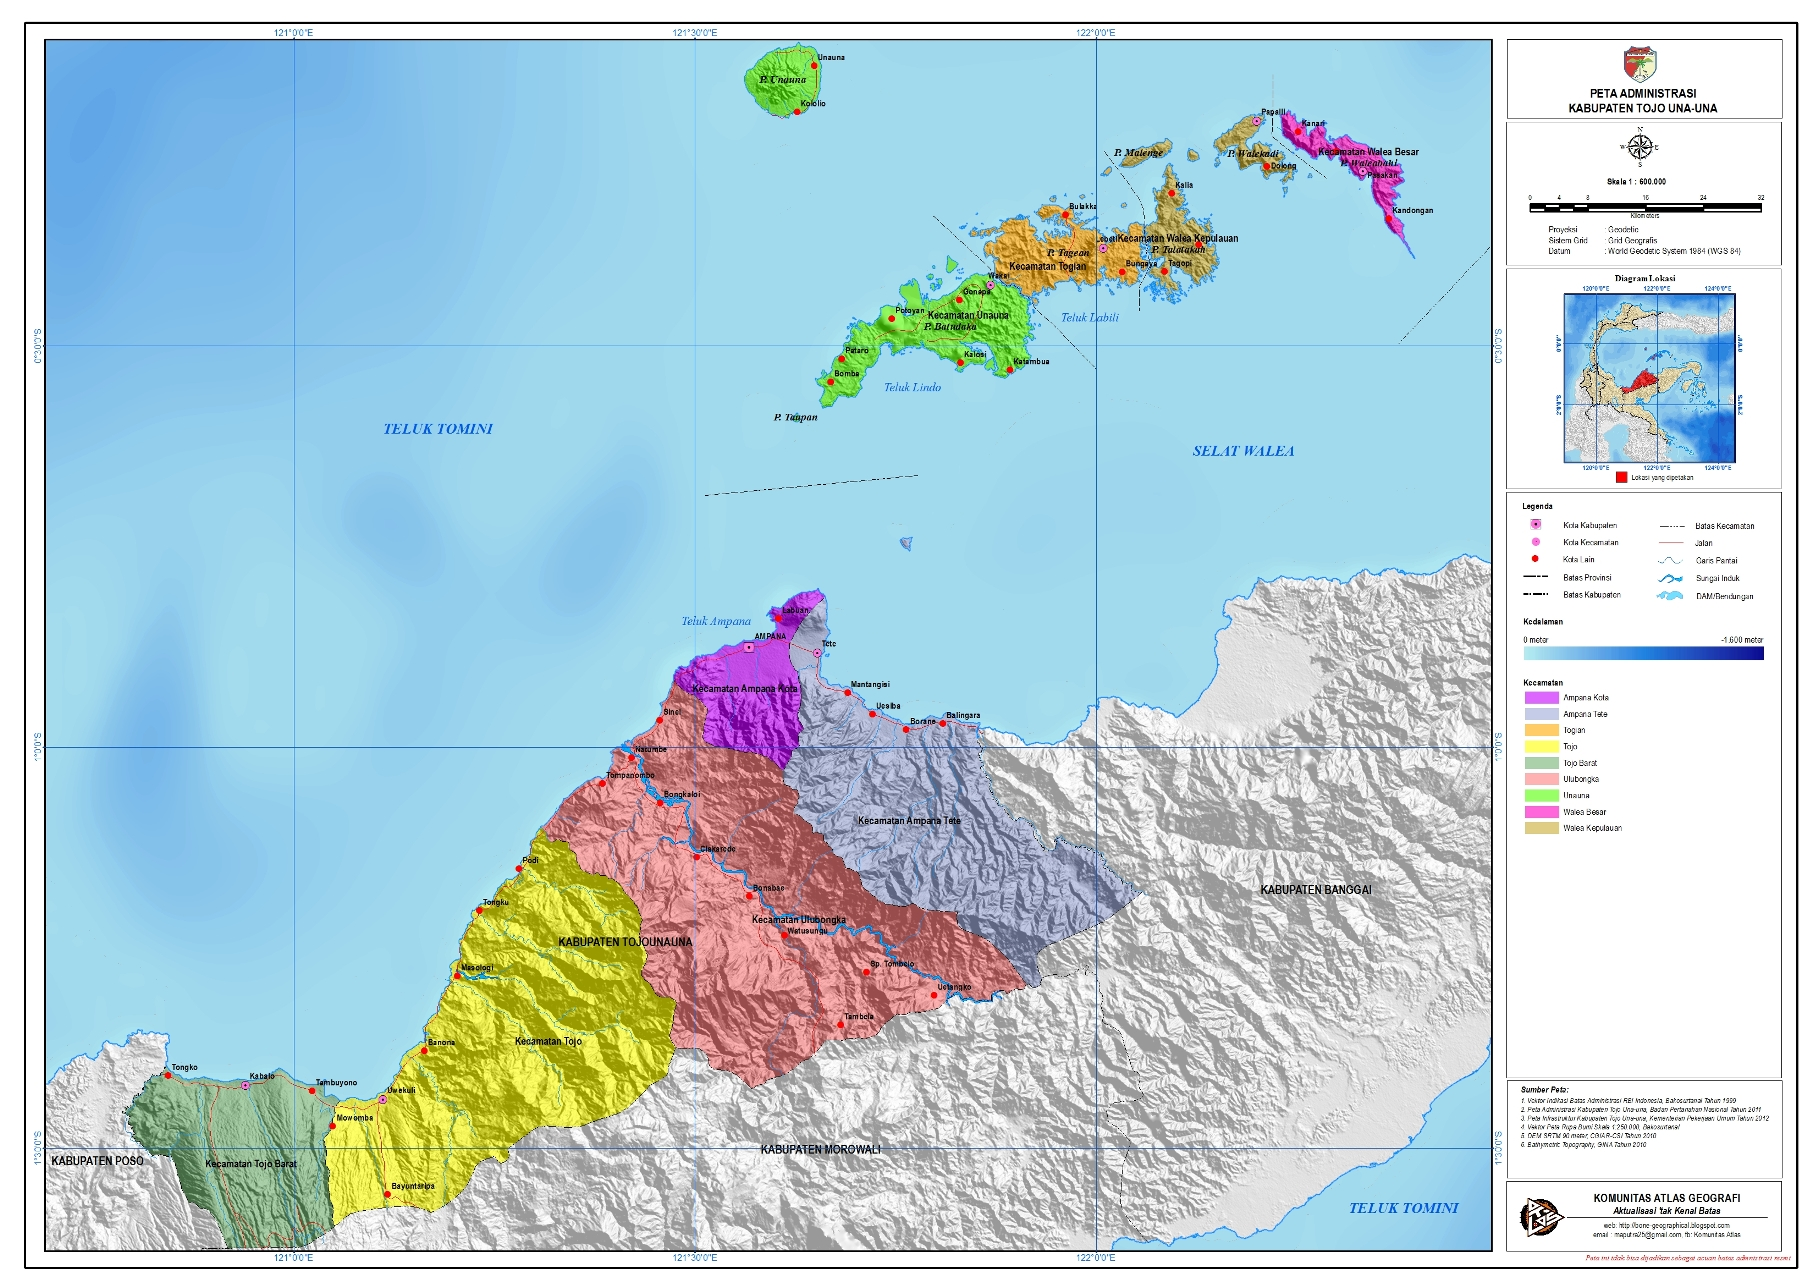 Pulau Una Una Indonesia  city photos : Administrasi Kabupaten Tojo Una una | Peta Tematik Indonesia